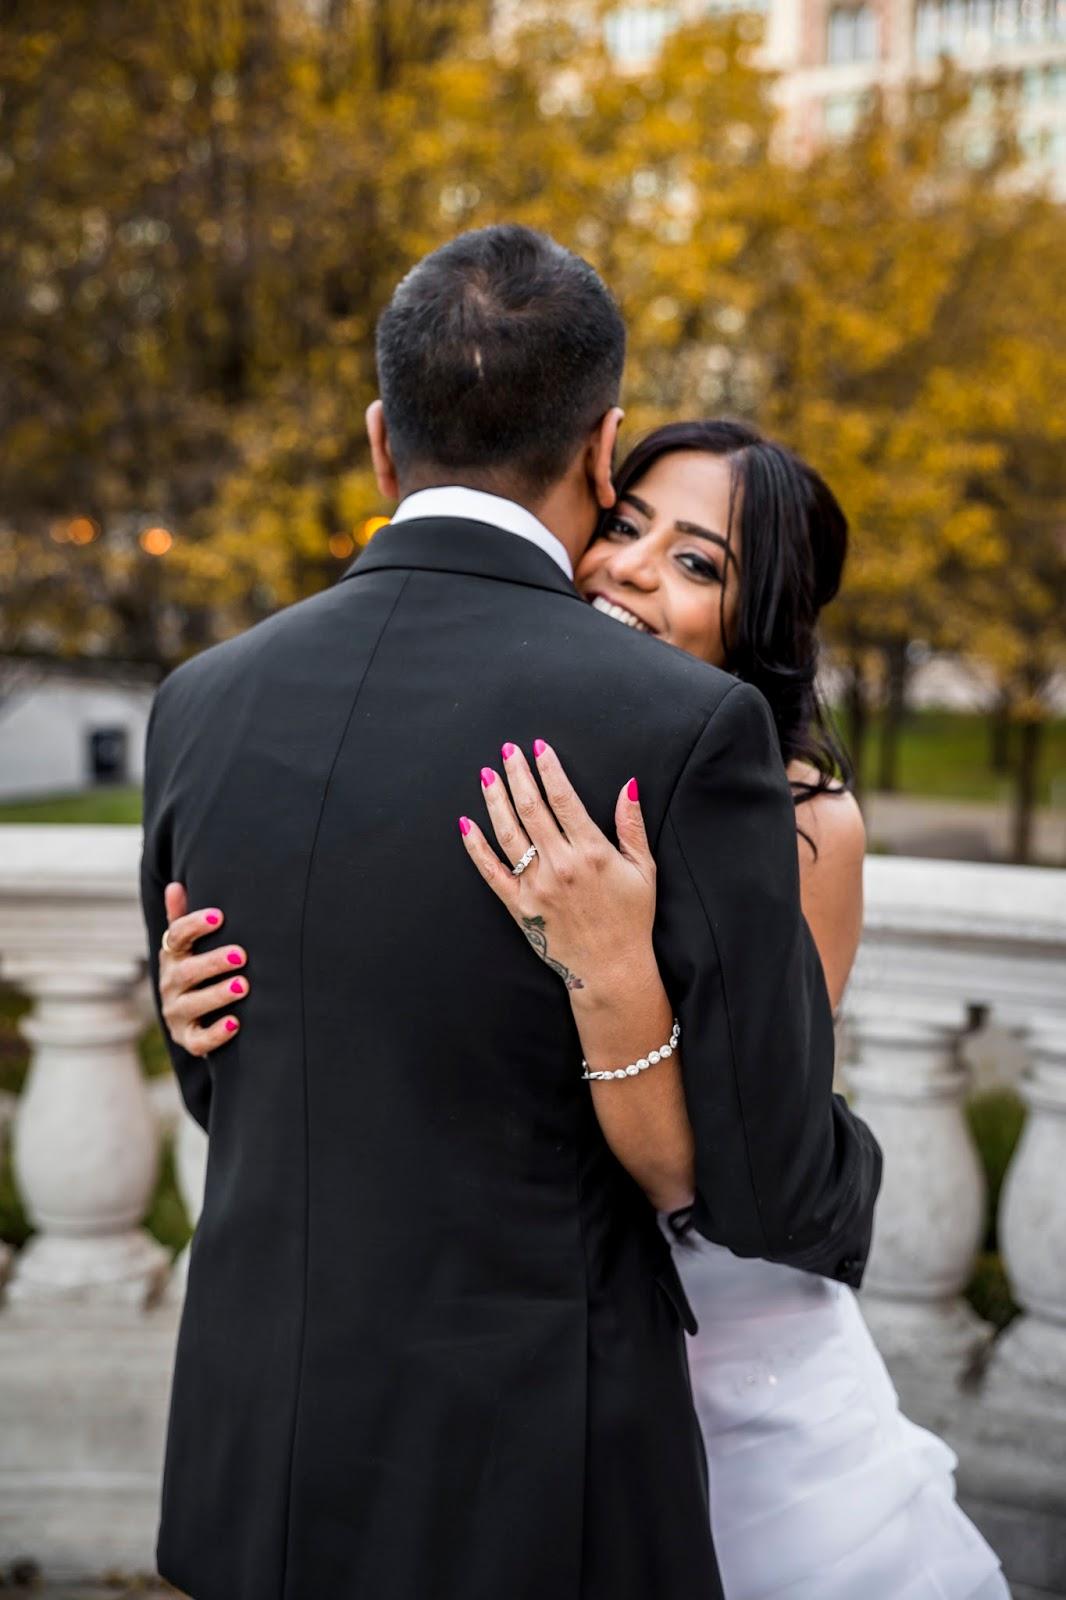 Chicago wedding photoshoot